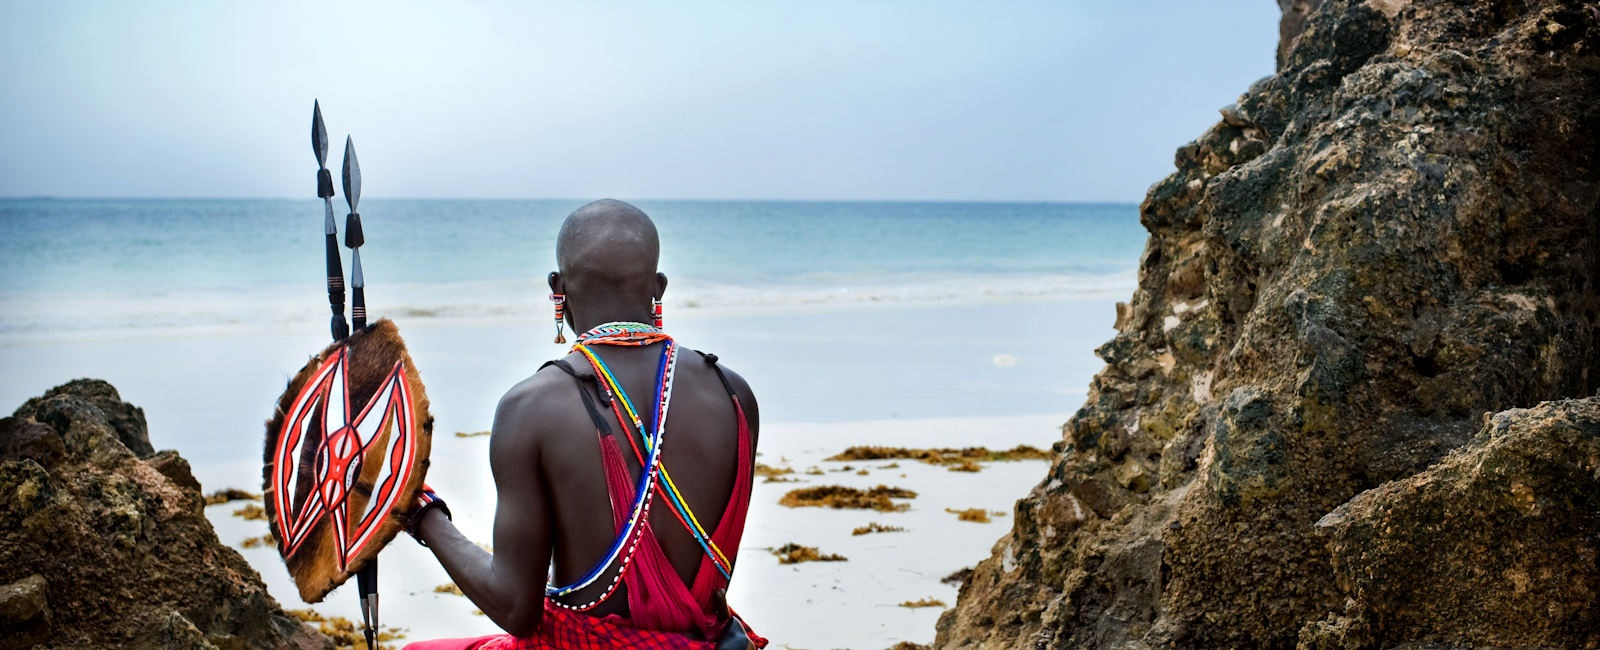 maasai on mombasa beach